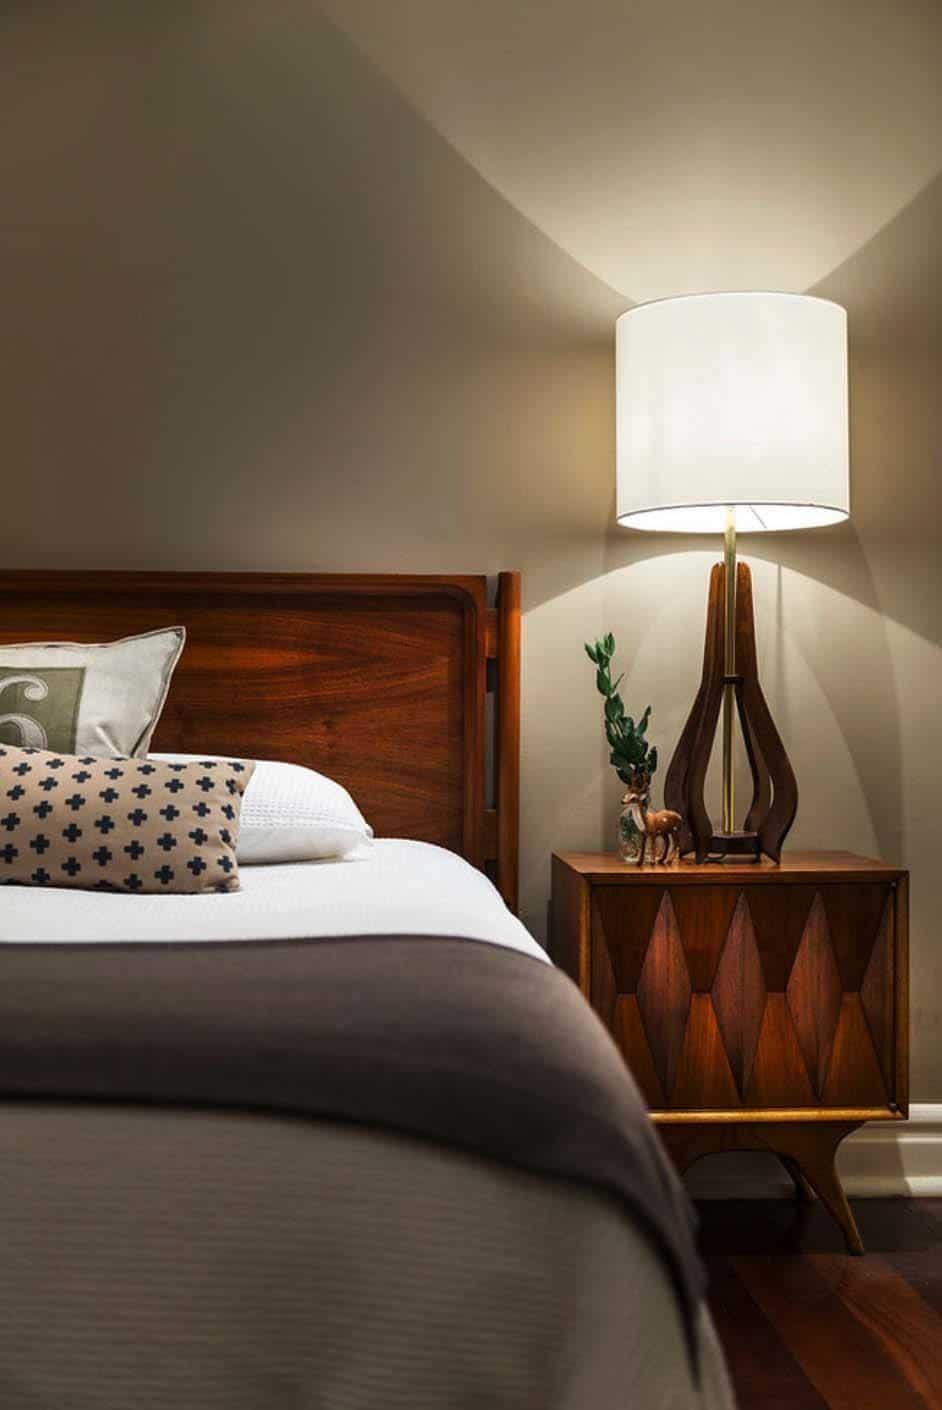 Modern Contemporary Bedroom Set: 35 Wonderfully Stylish Mid-century Modern Bedrooms